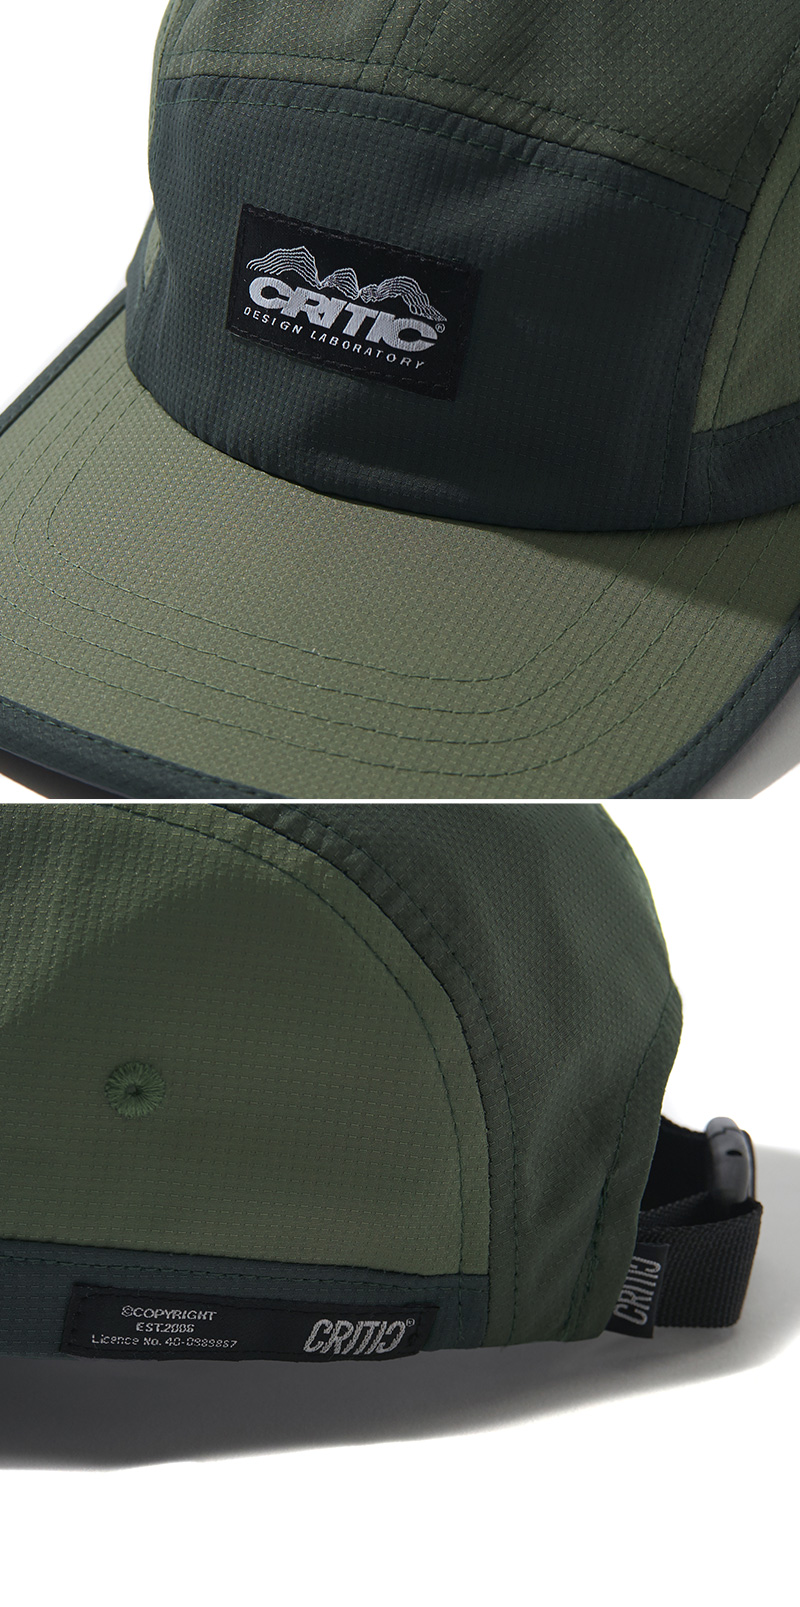 3 TONE CAMP CAP(KHAKI)_CTONIHW04UK0